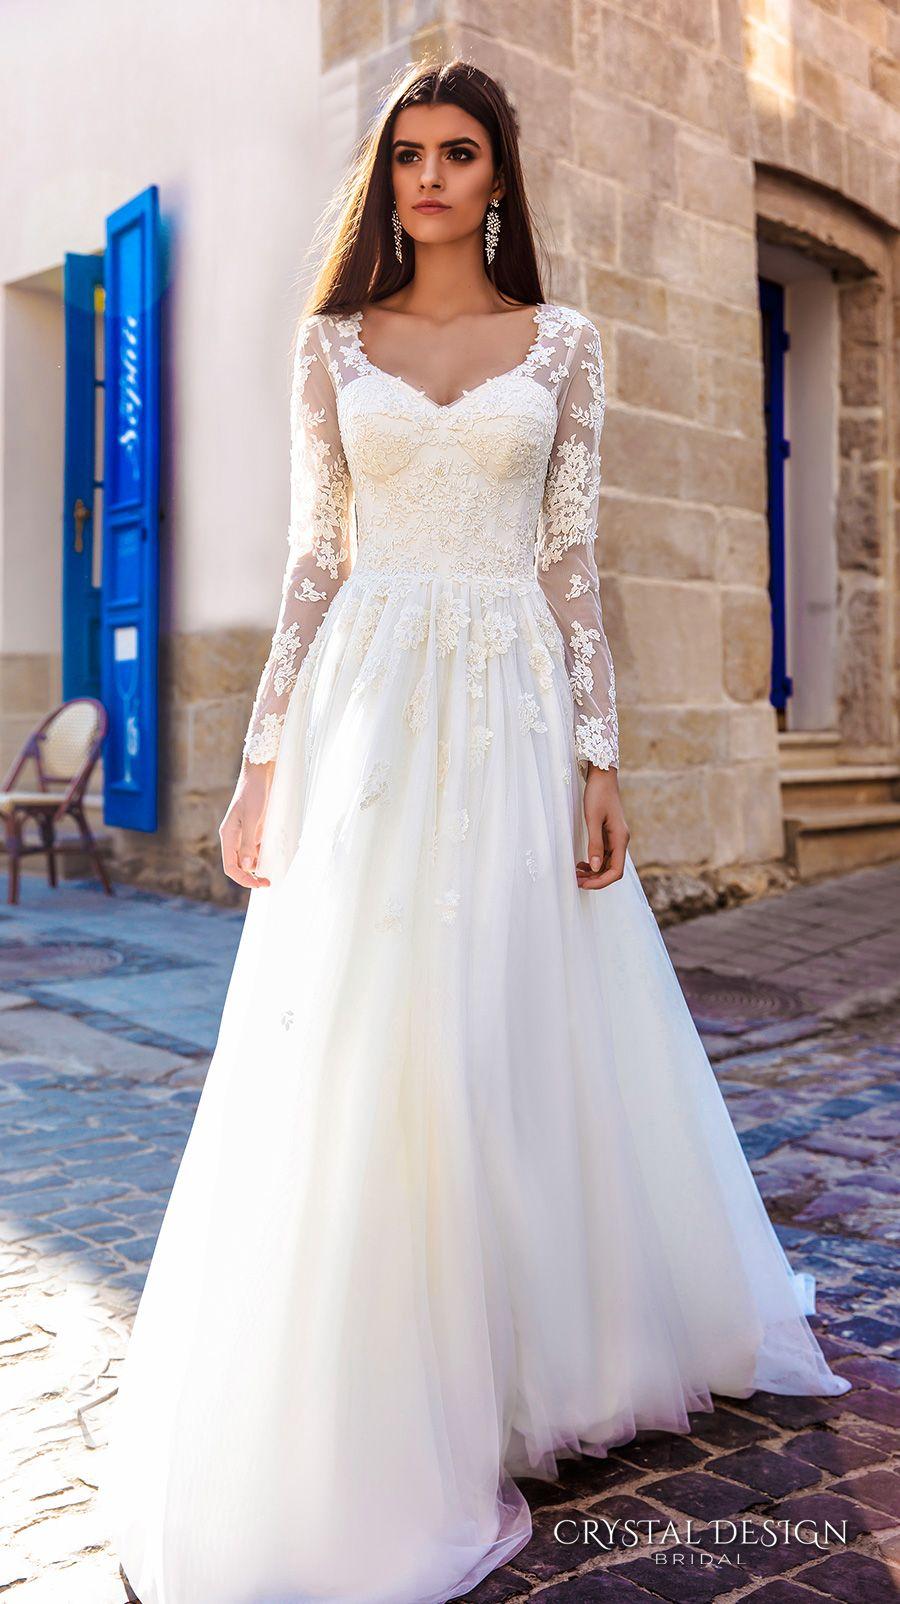 sheer lace wedding dress Bridal